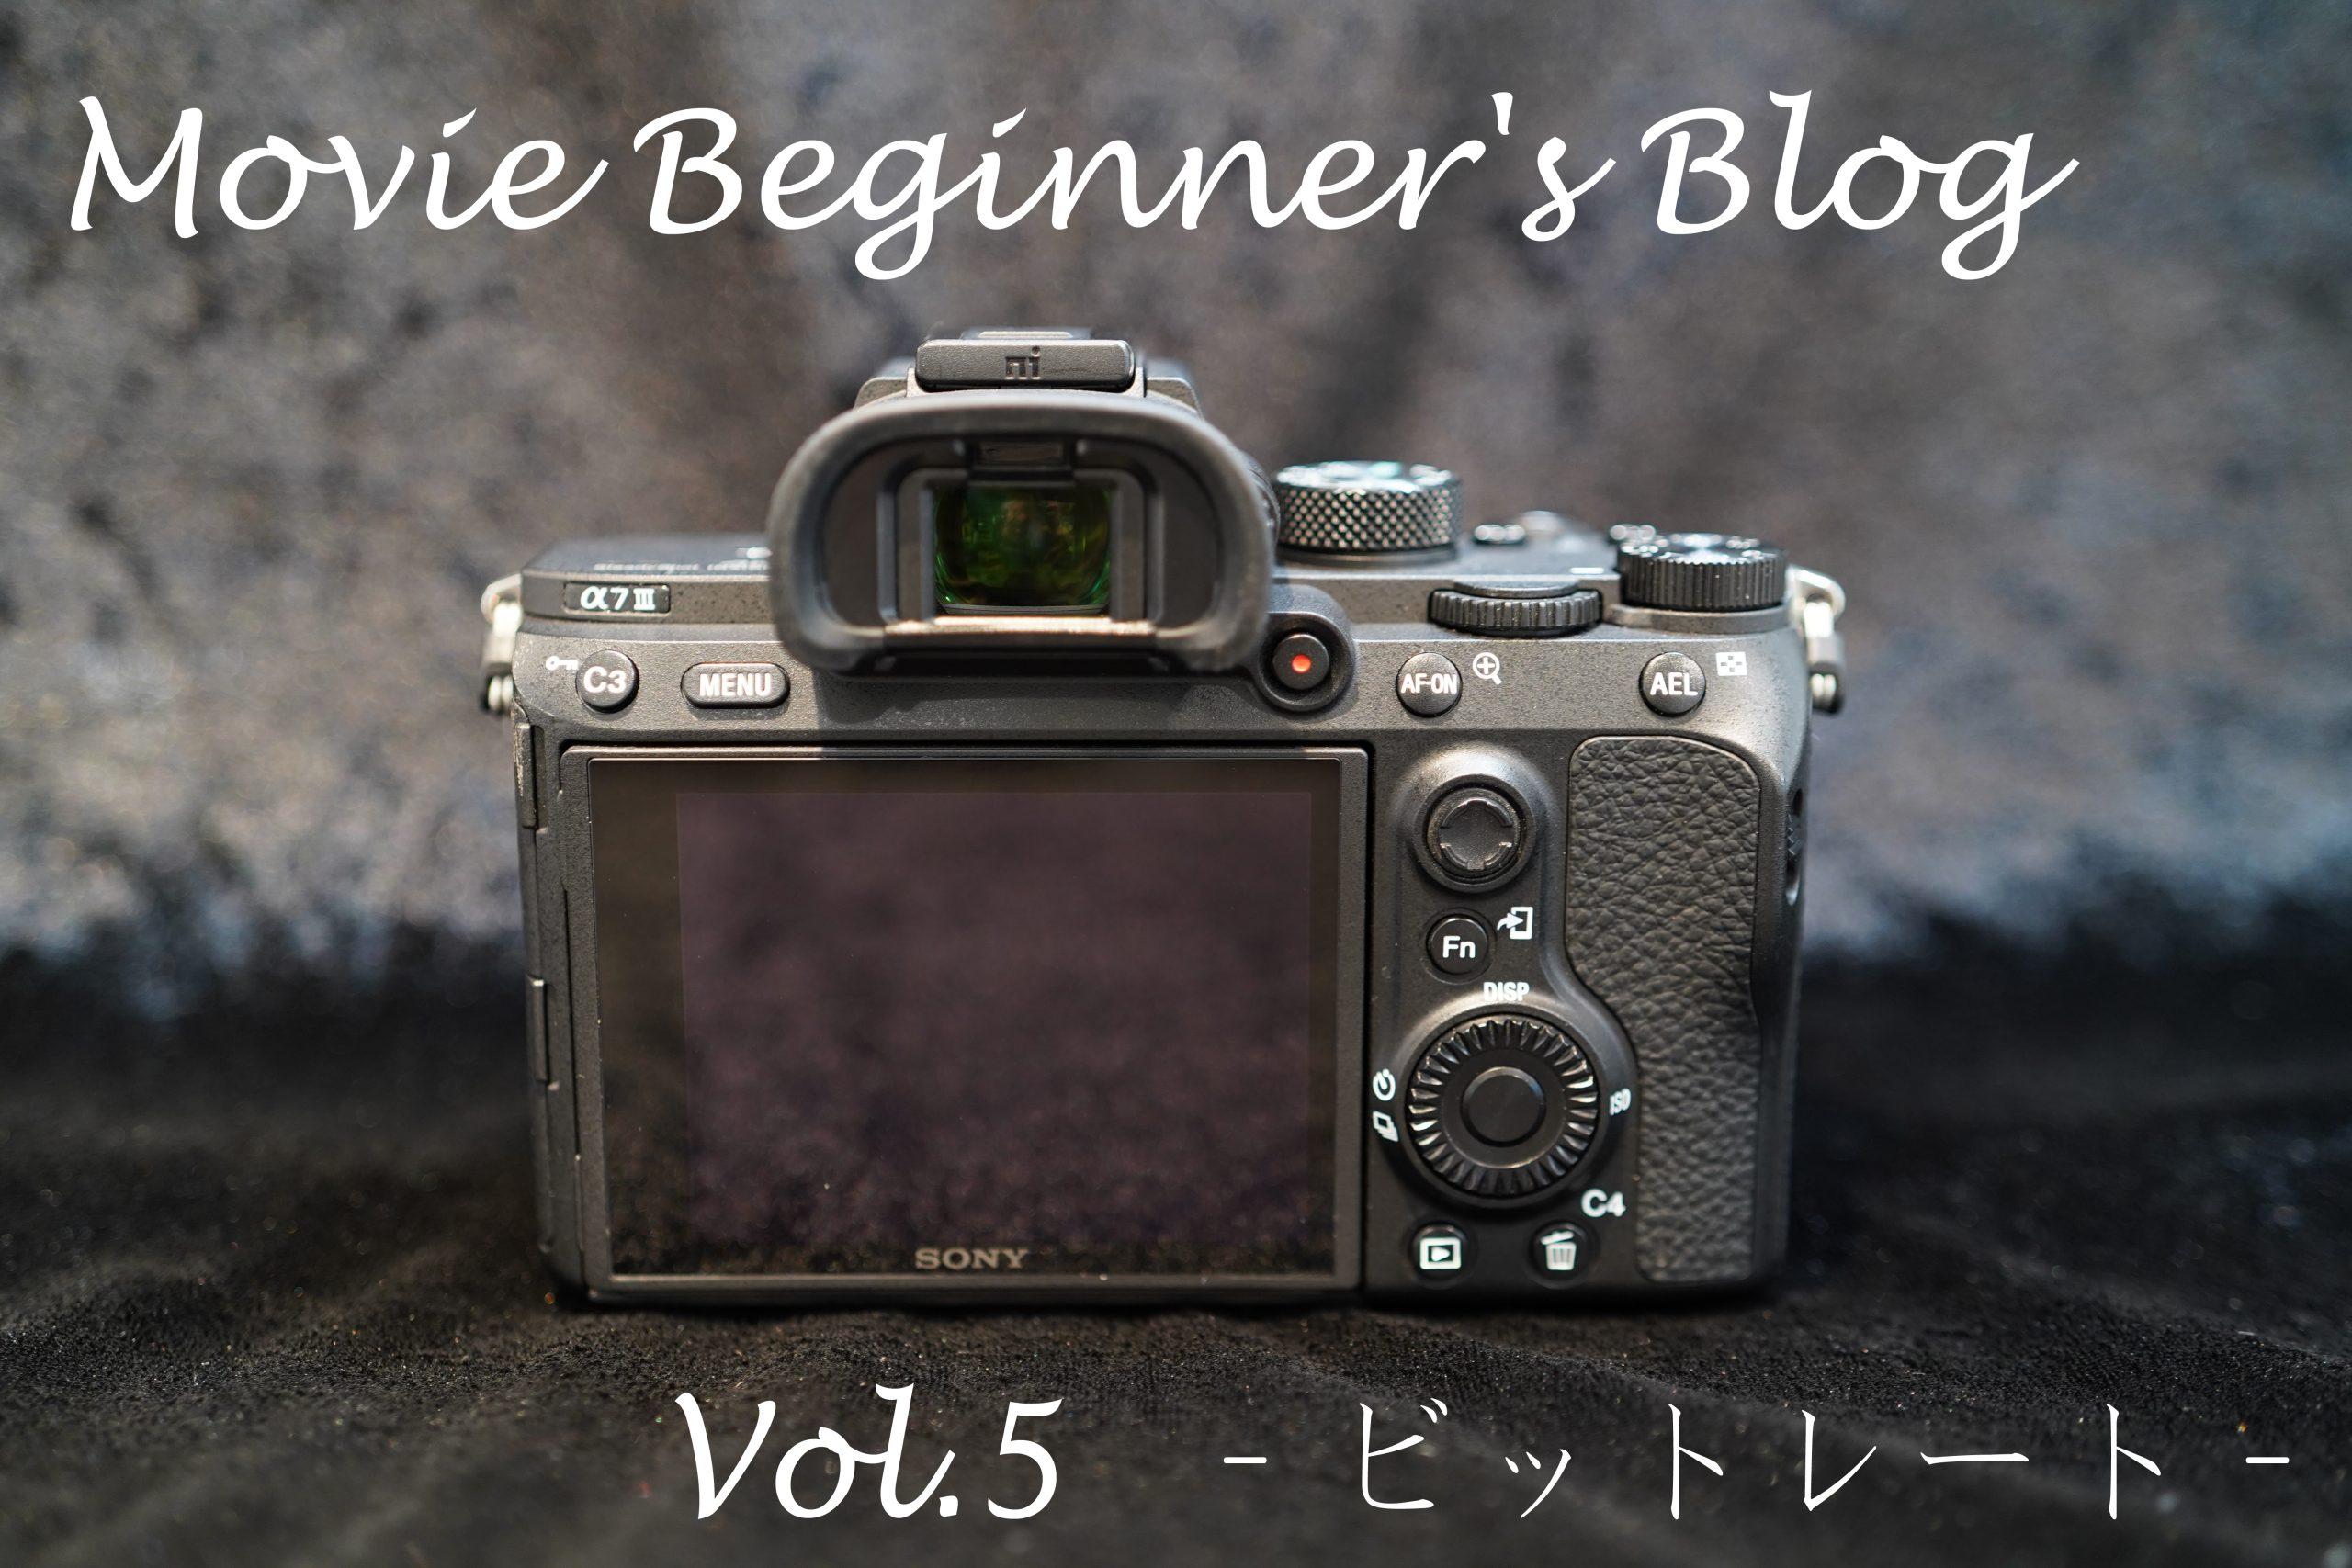 【SONY】Movie Beginner's Blog Vol.5 -ビットレート-